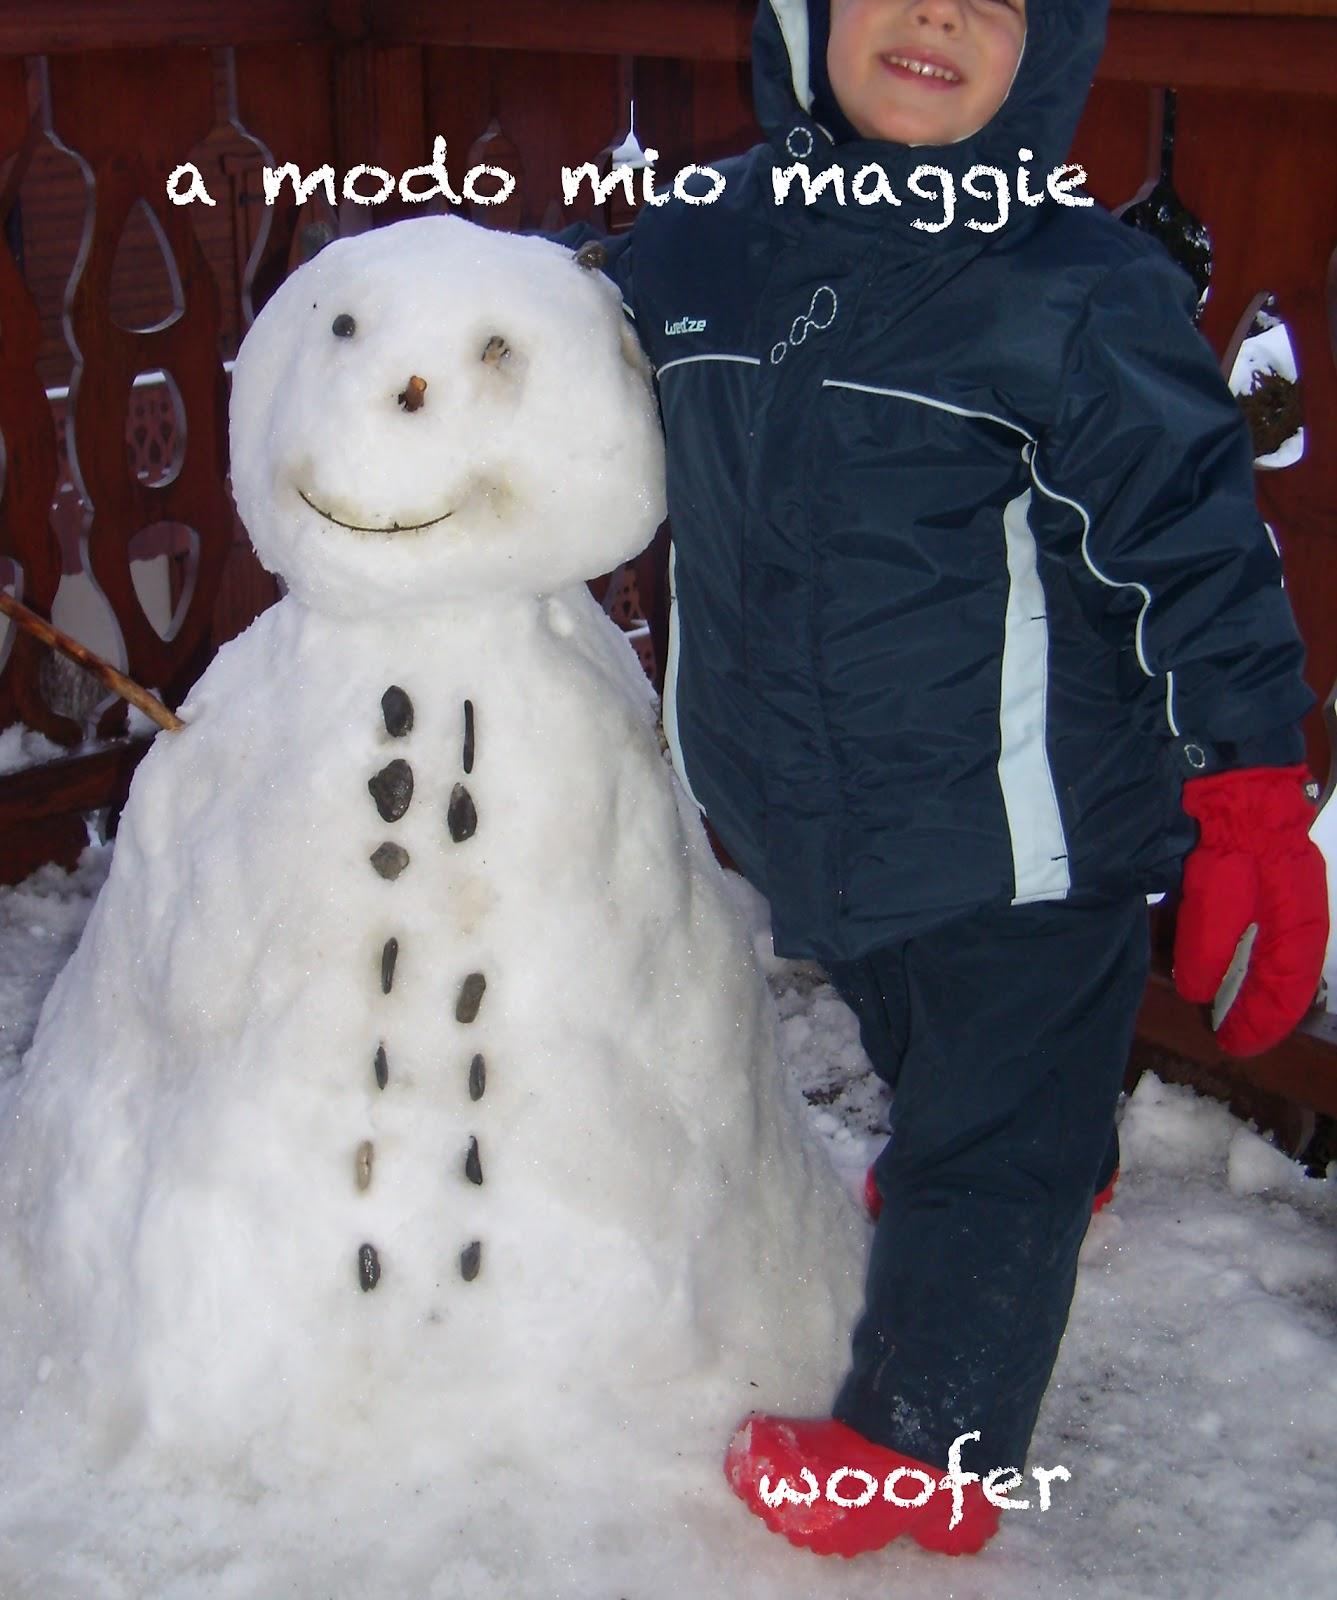 Immagini Divertenti Juventus Roma Si24 - immagini divertenti juve roma